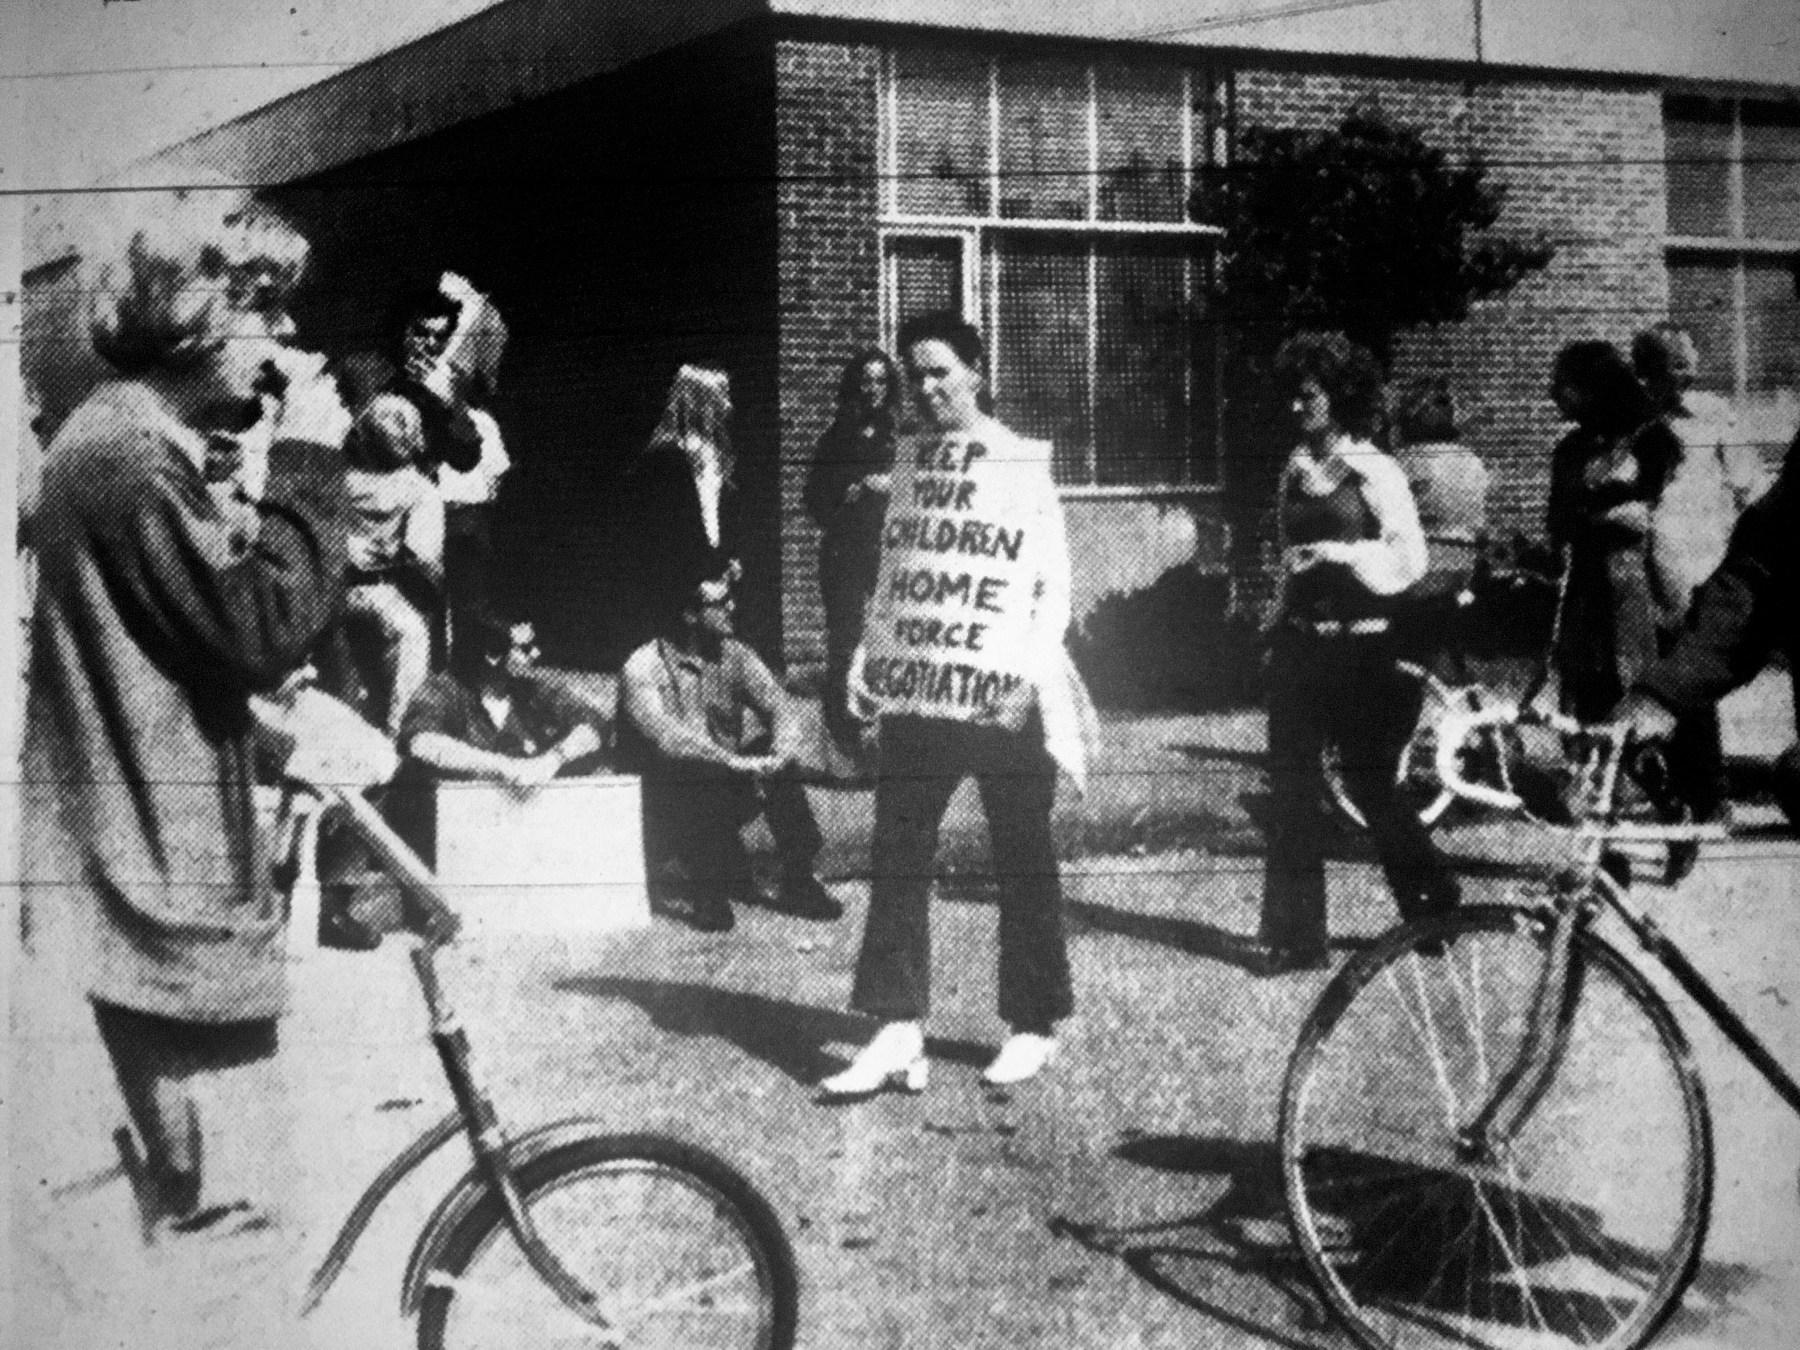 Teacher strike, Burlington MA